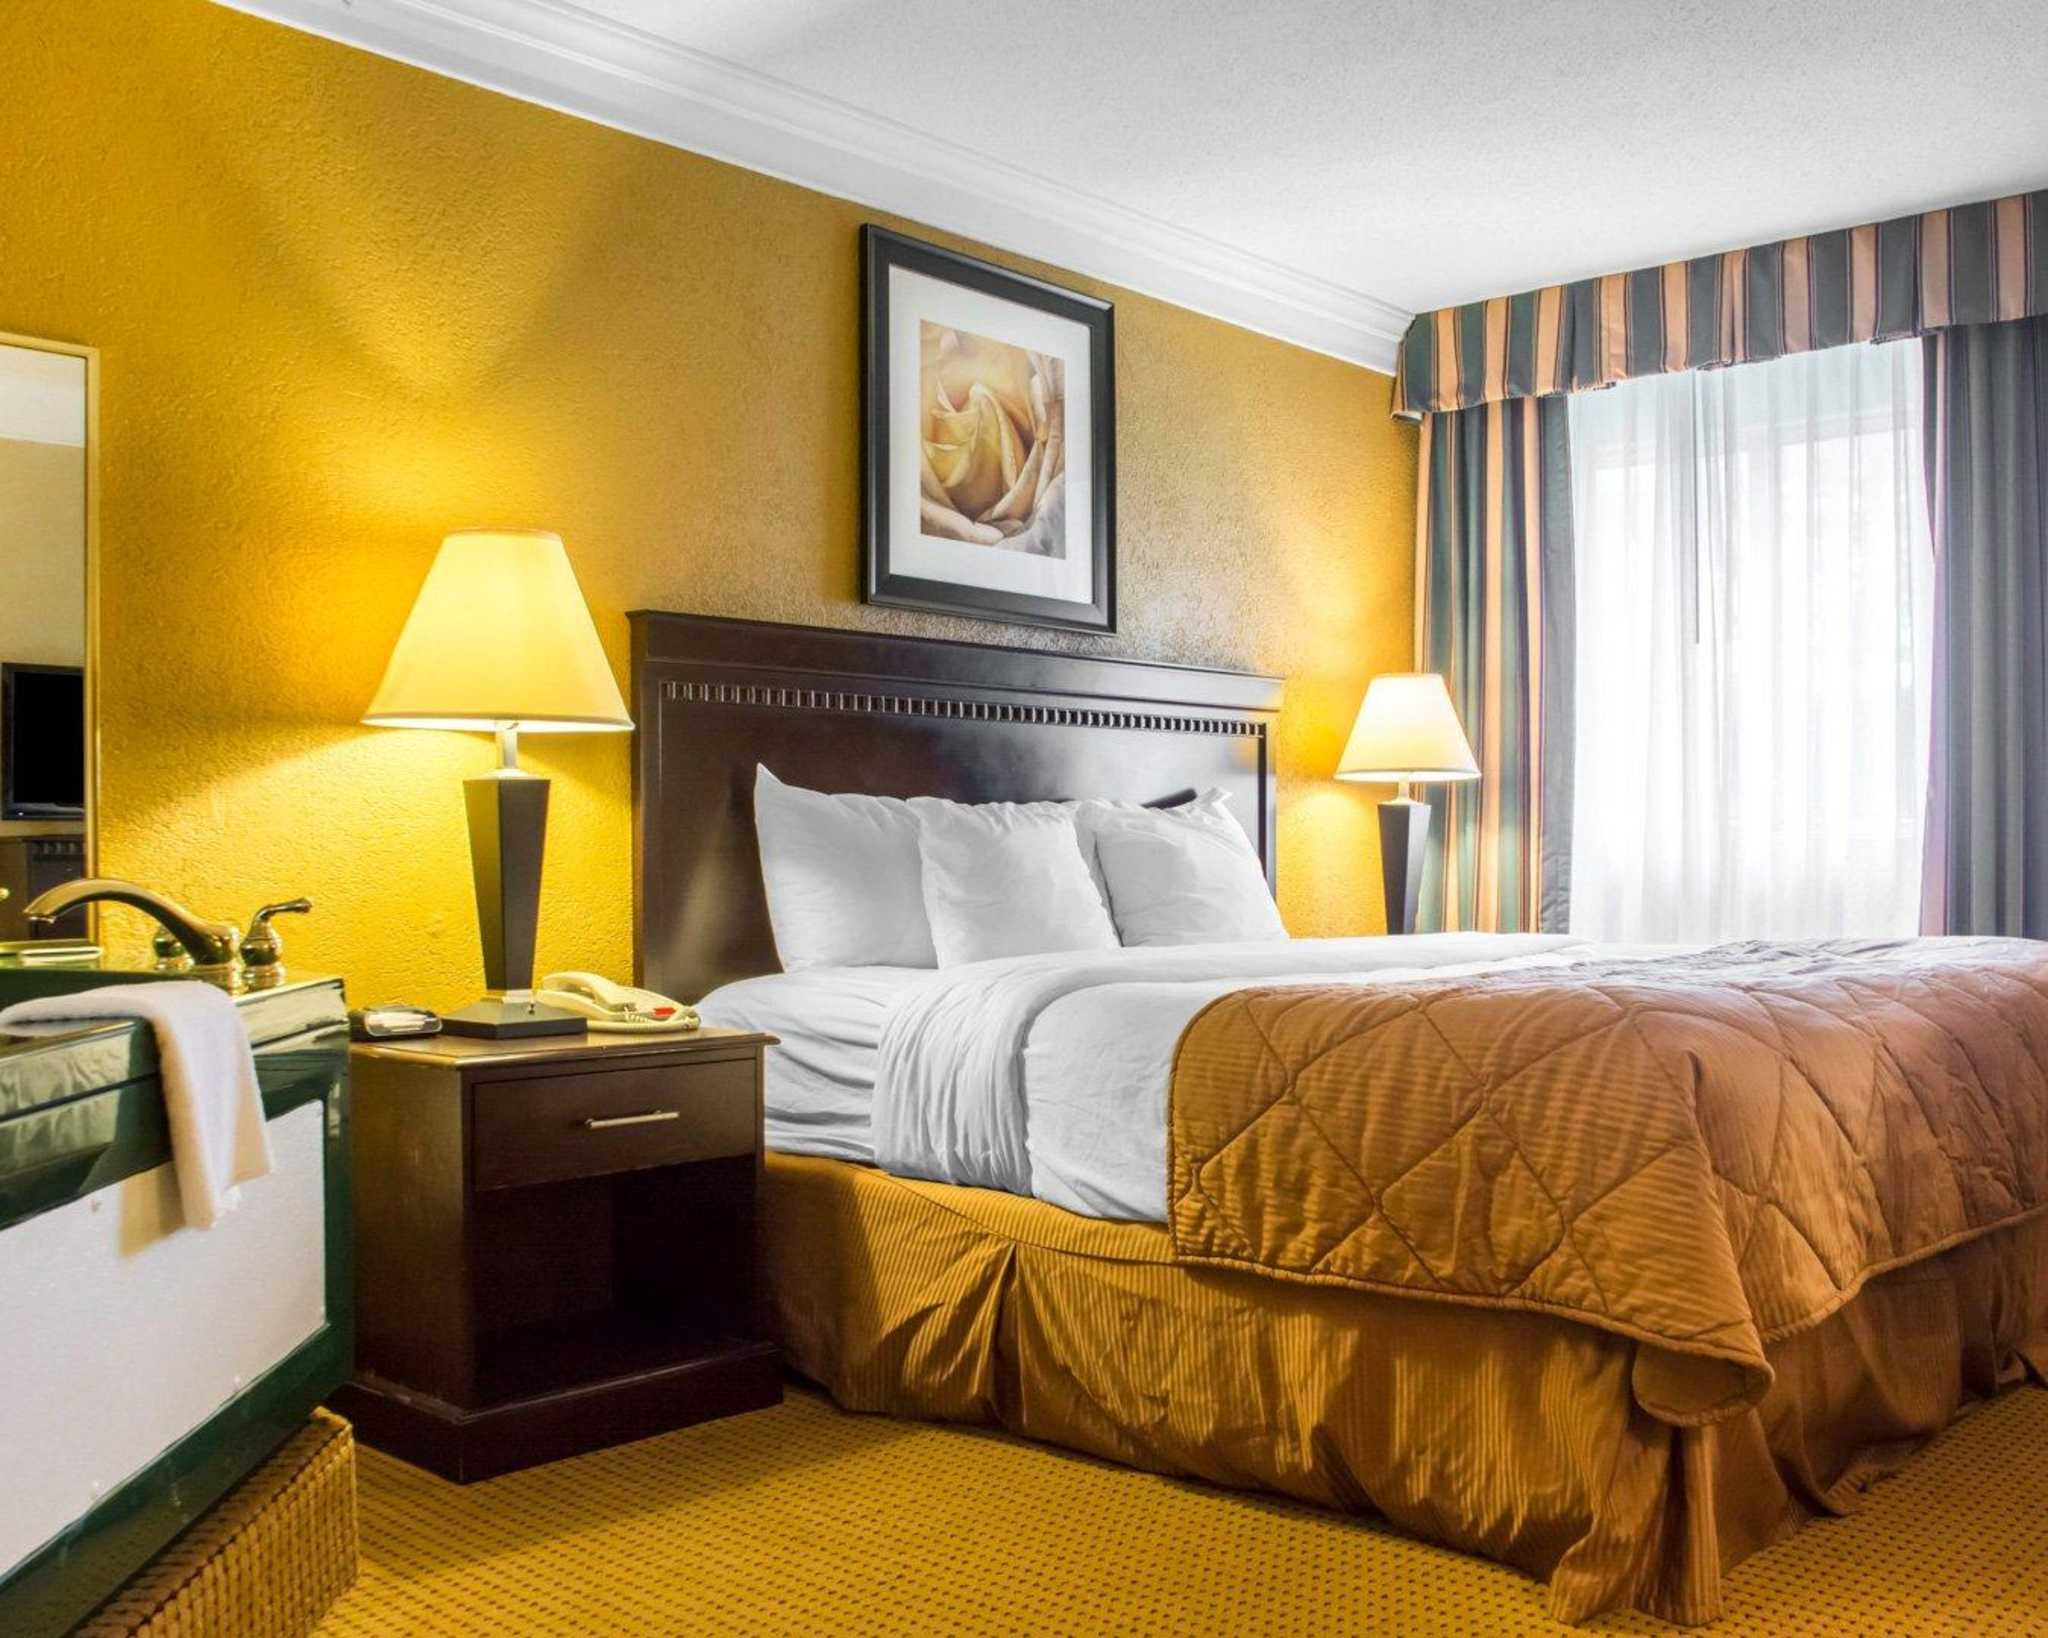 Quality Inn & Suites Fairgrounds image 19